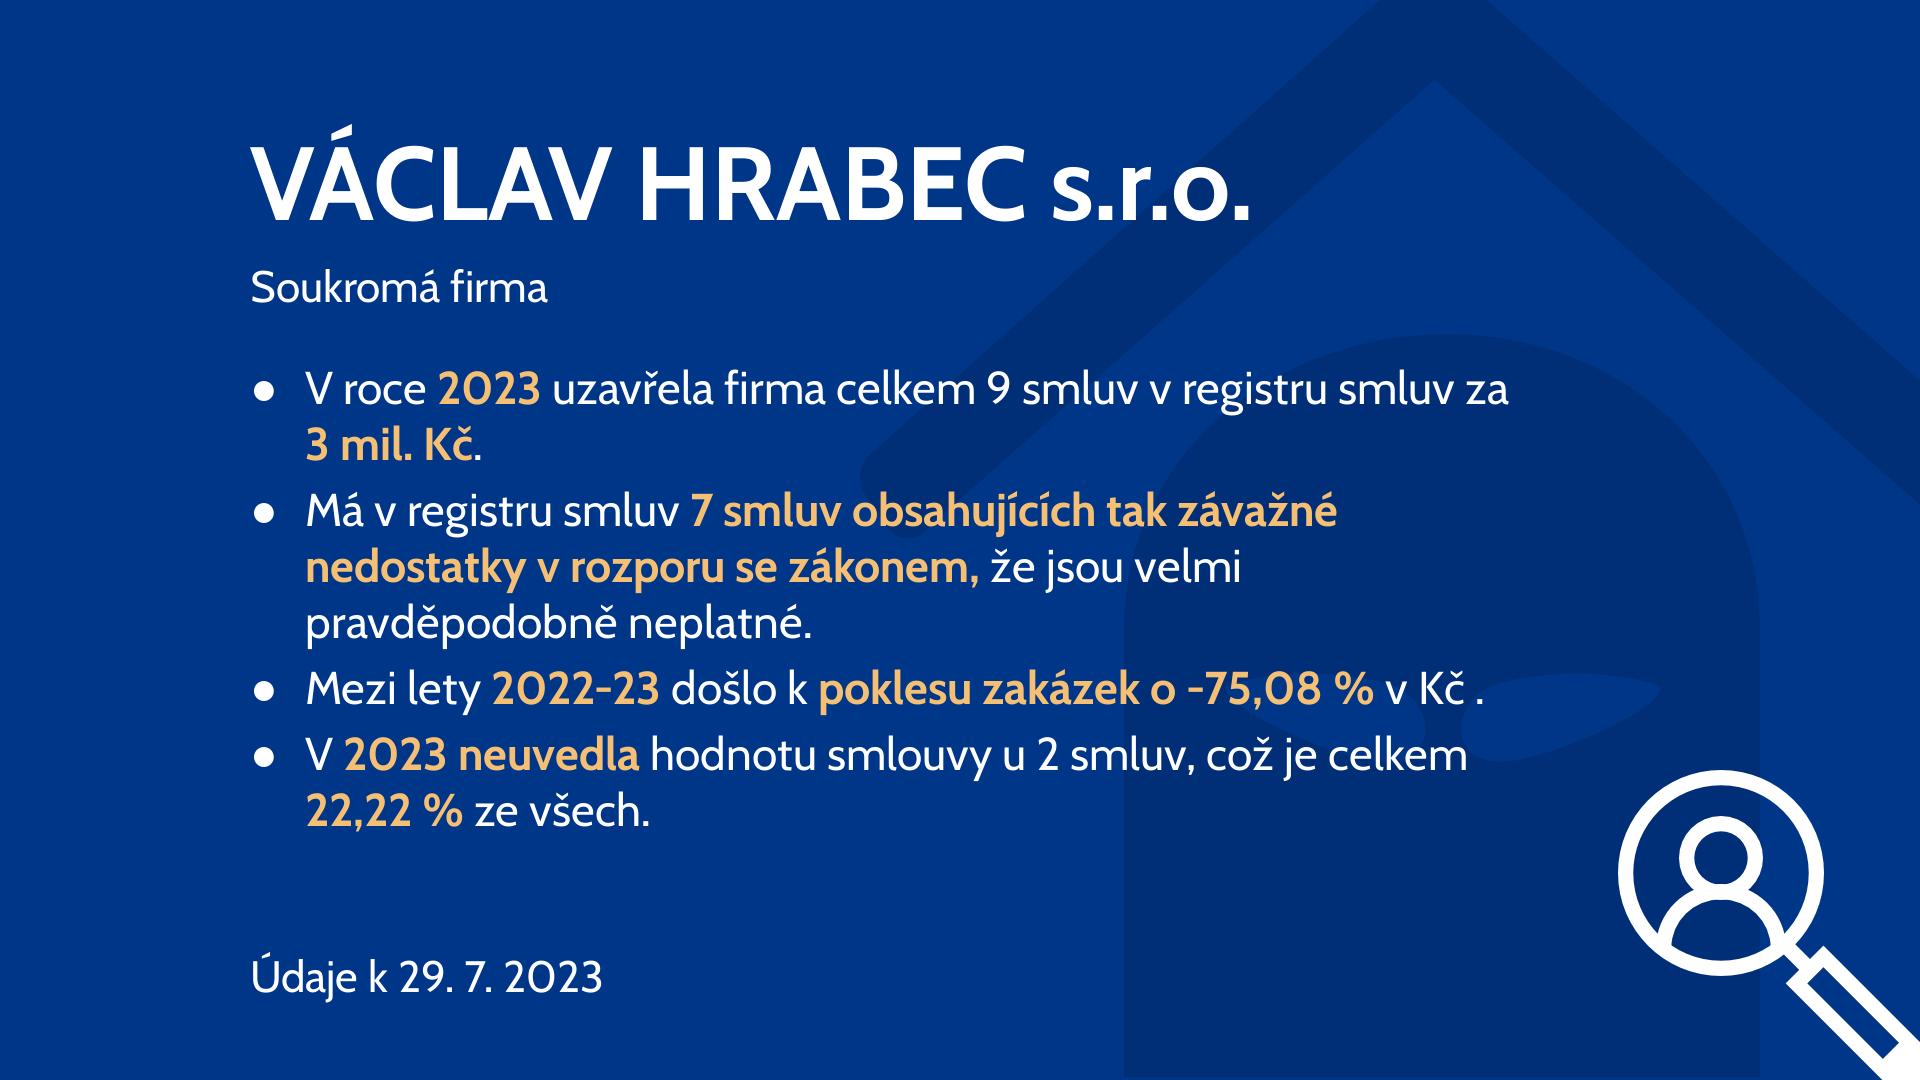 Informace o VÁCLAV HRABEC s.r.o. - Hlídač státu. 133a600a4e